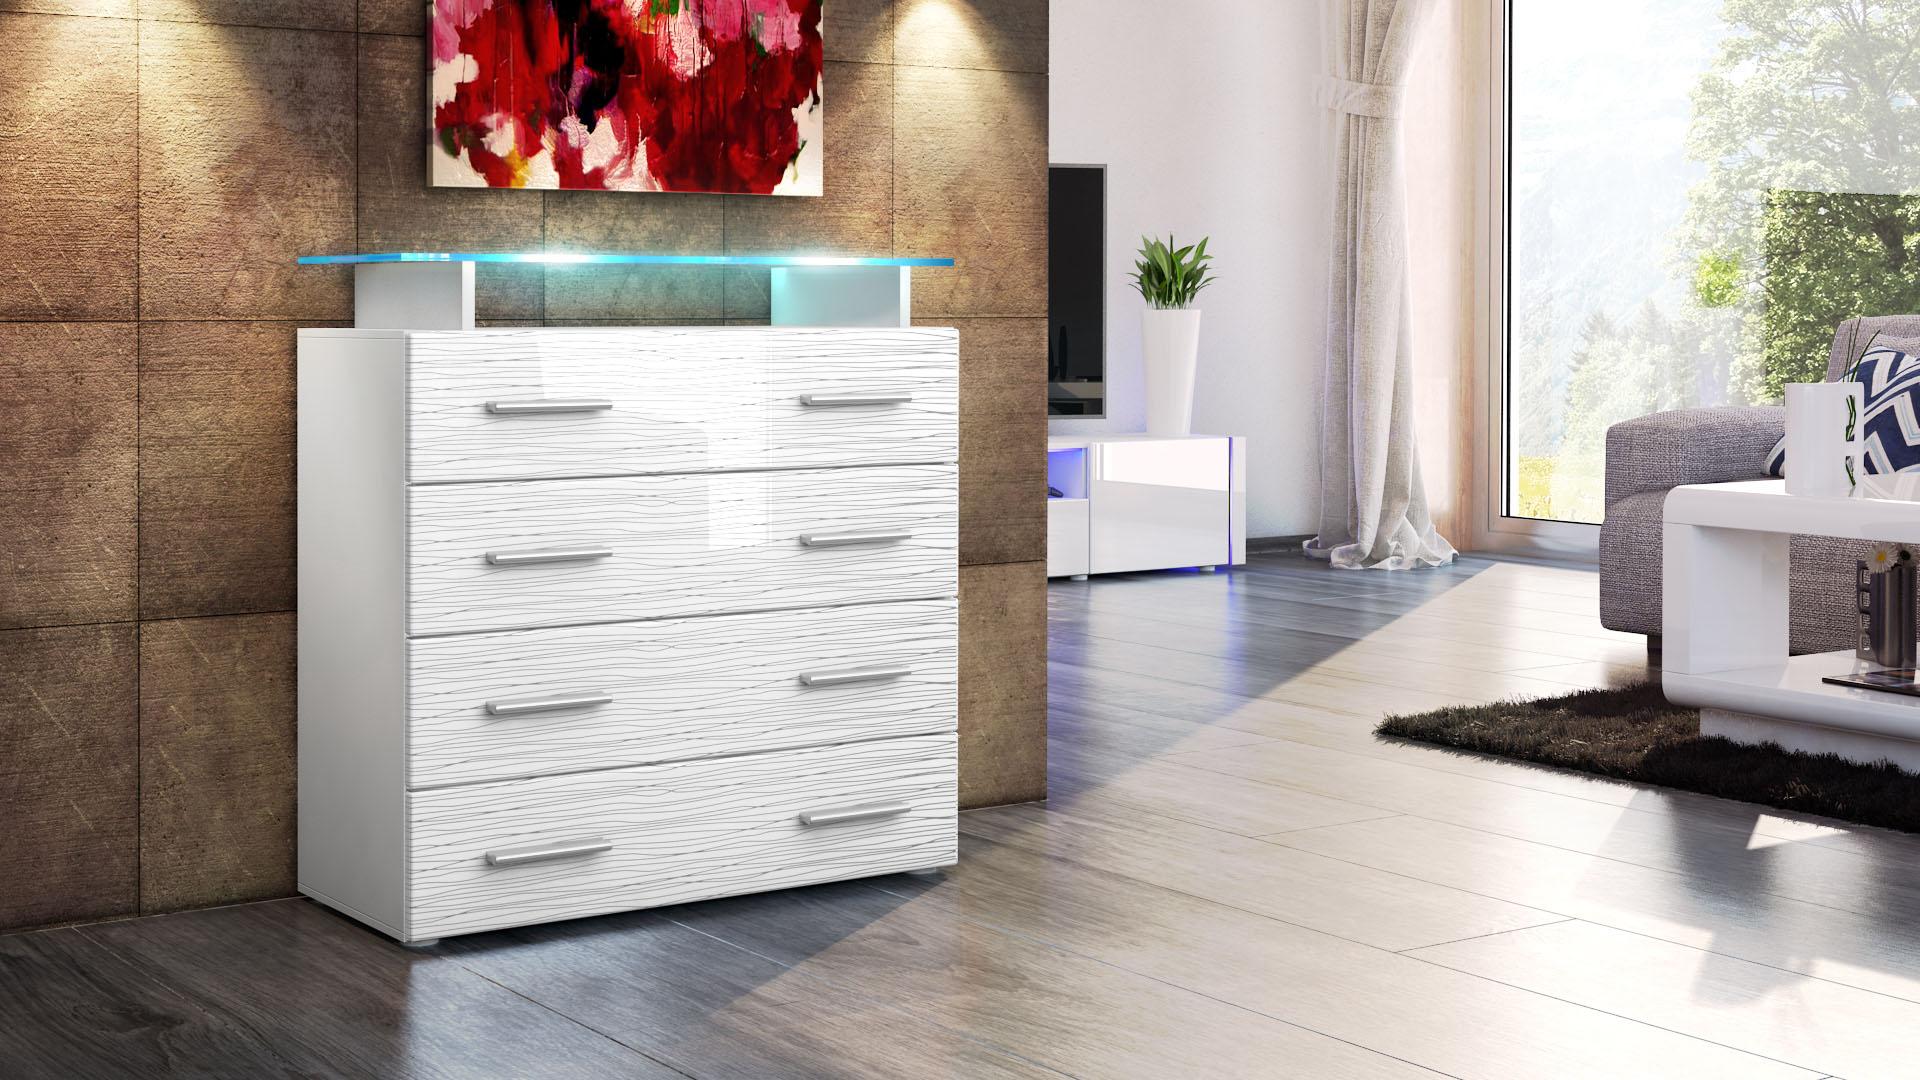 kommode sideboard pavos v2 in wei und schwarz silverline limited edition ebay. Black Bedroom Furniture Sets. Home Design Ideas